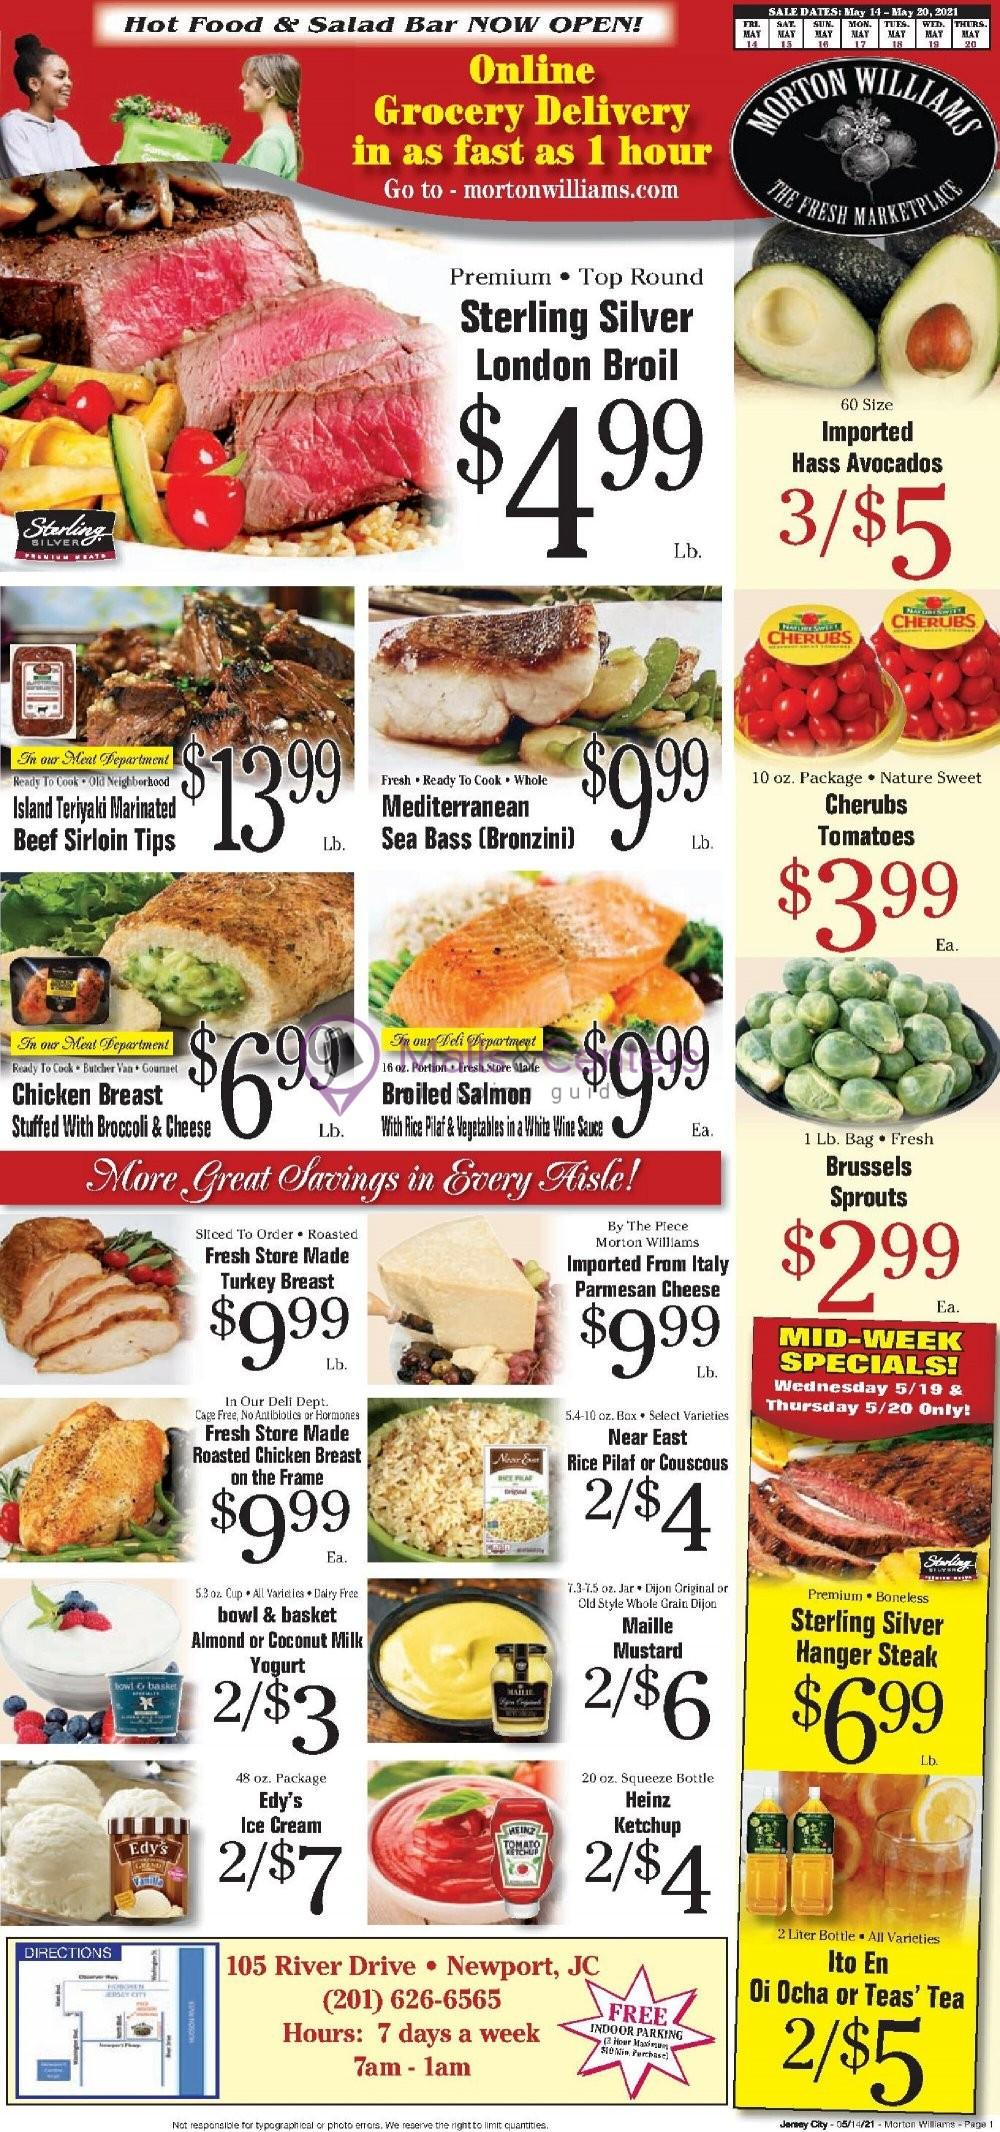 weekly ads Morton Williams Supermarket - page 1 - mallscenters.com